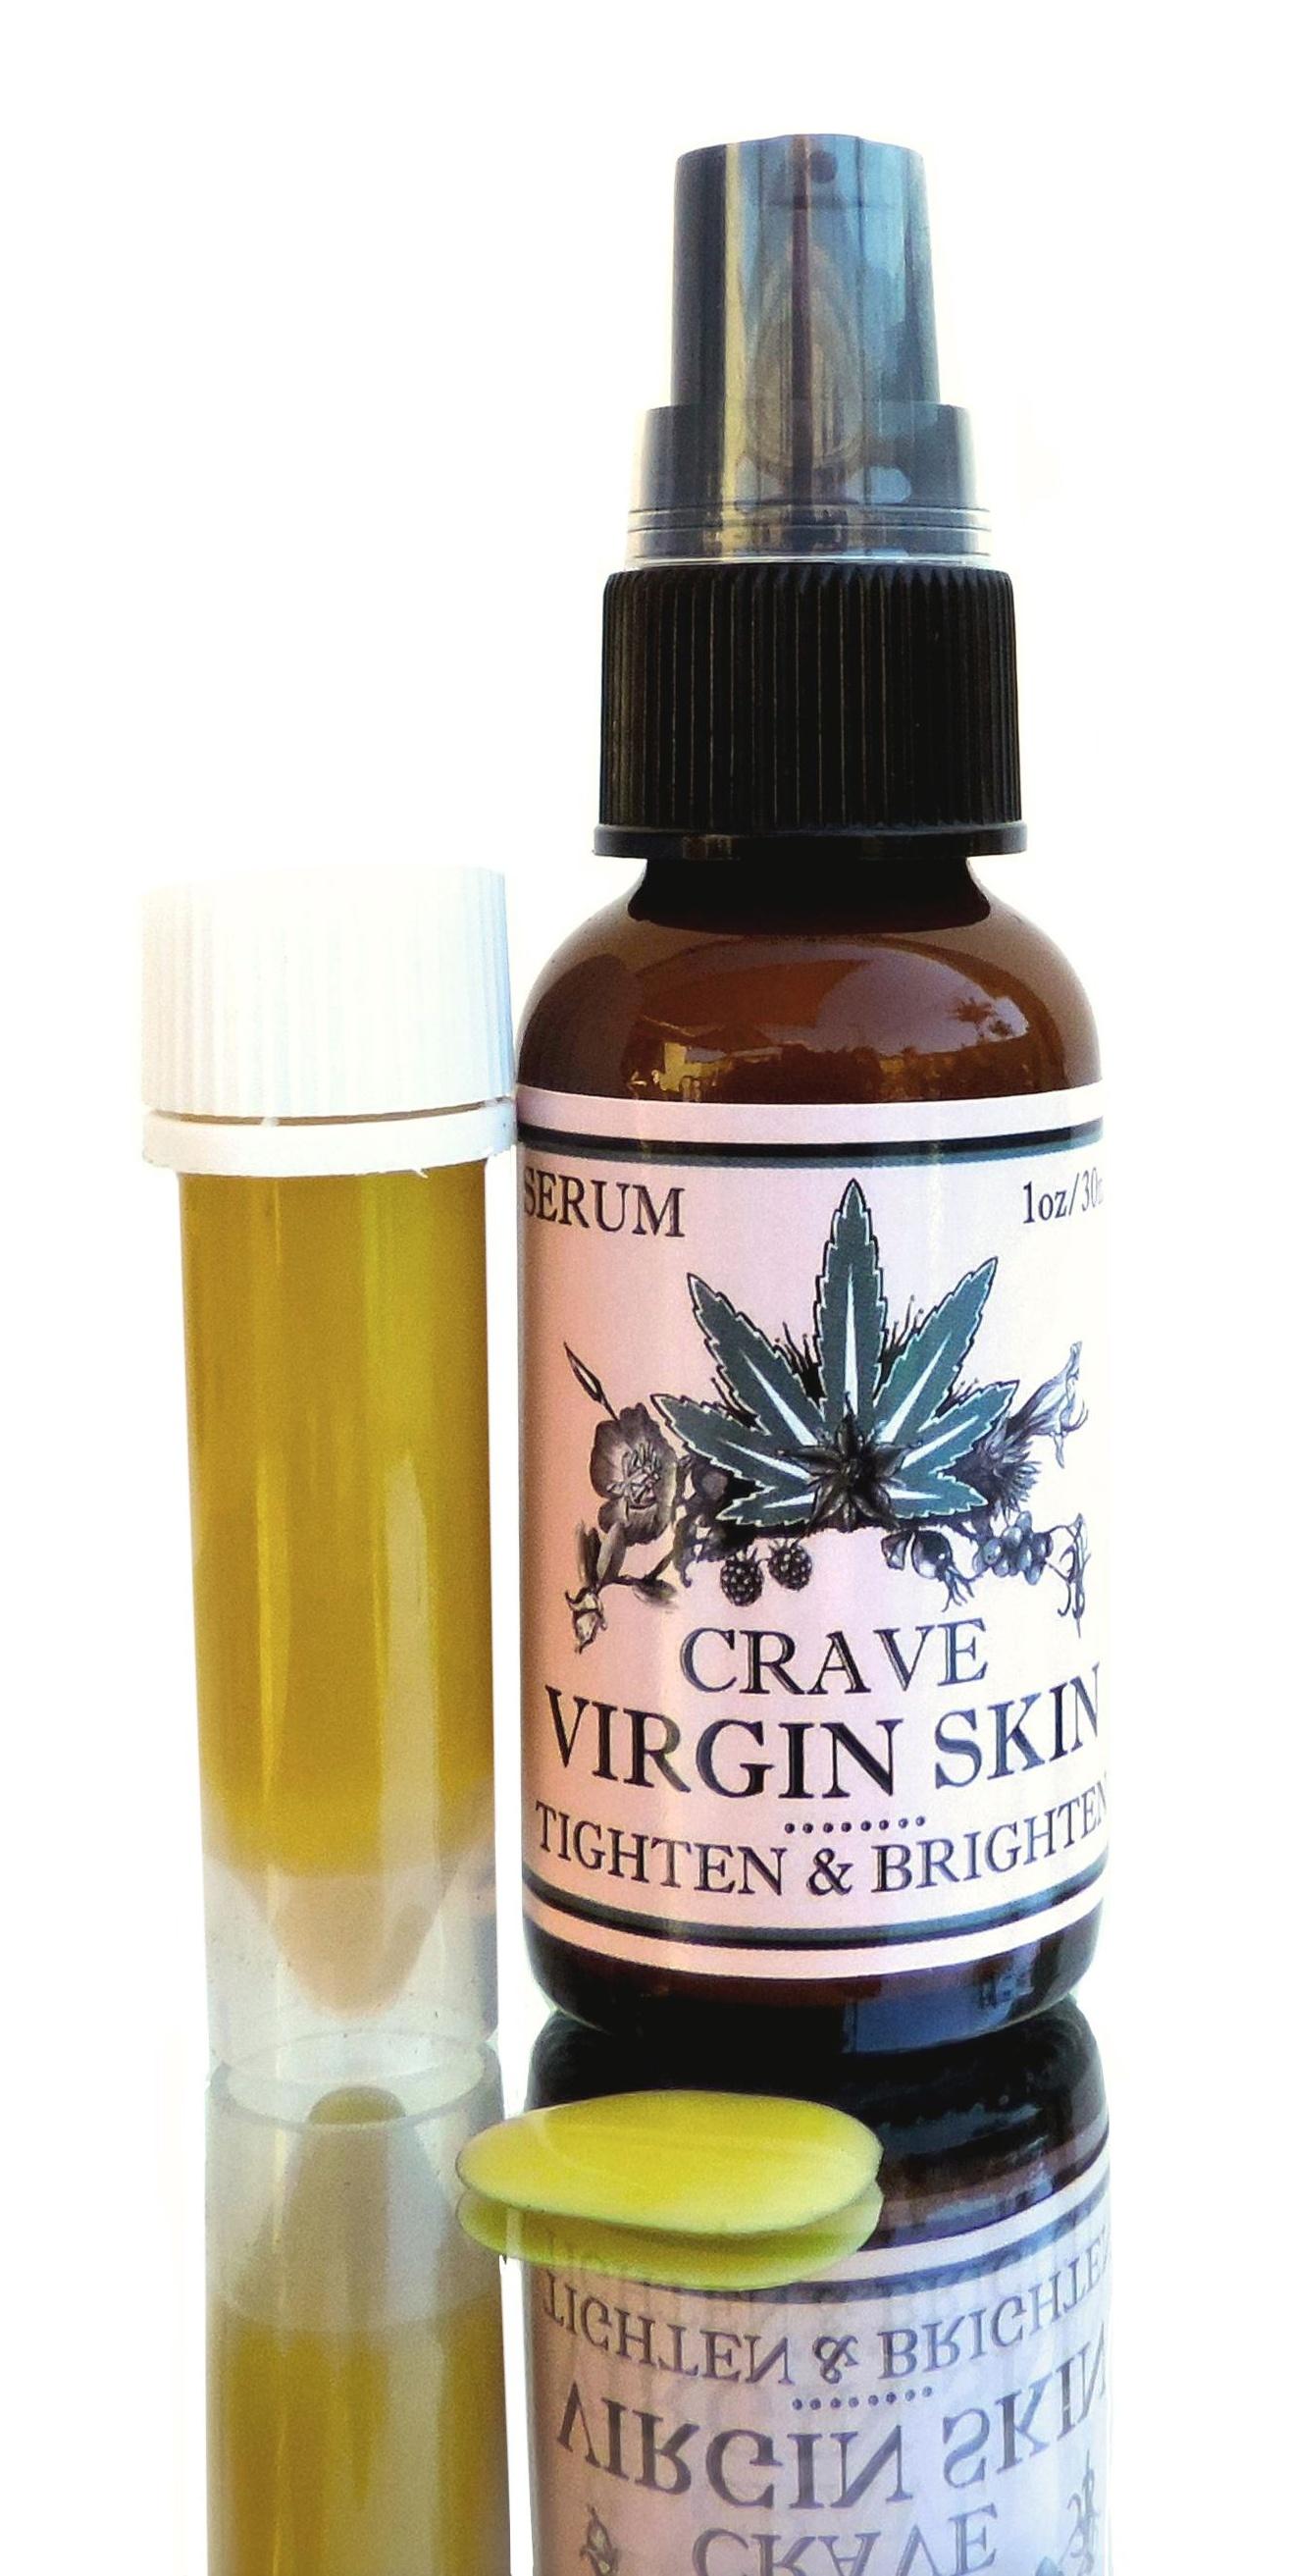 Crave Skincare Virgin Skin Tightening And Brightening Serem